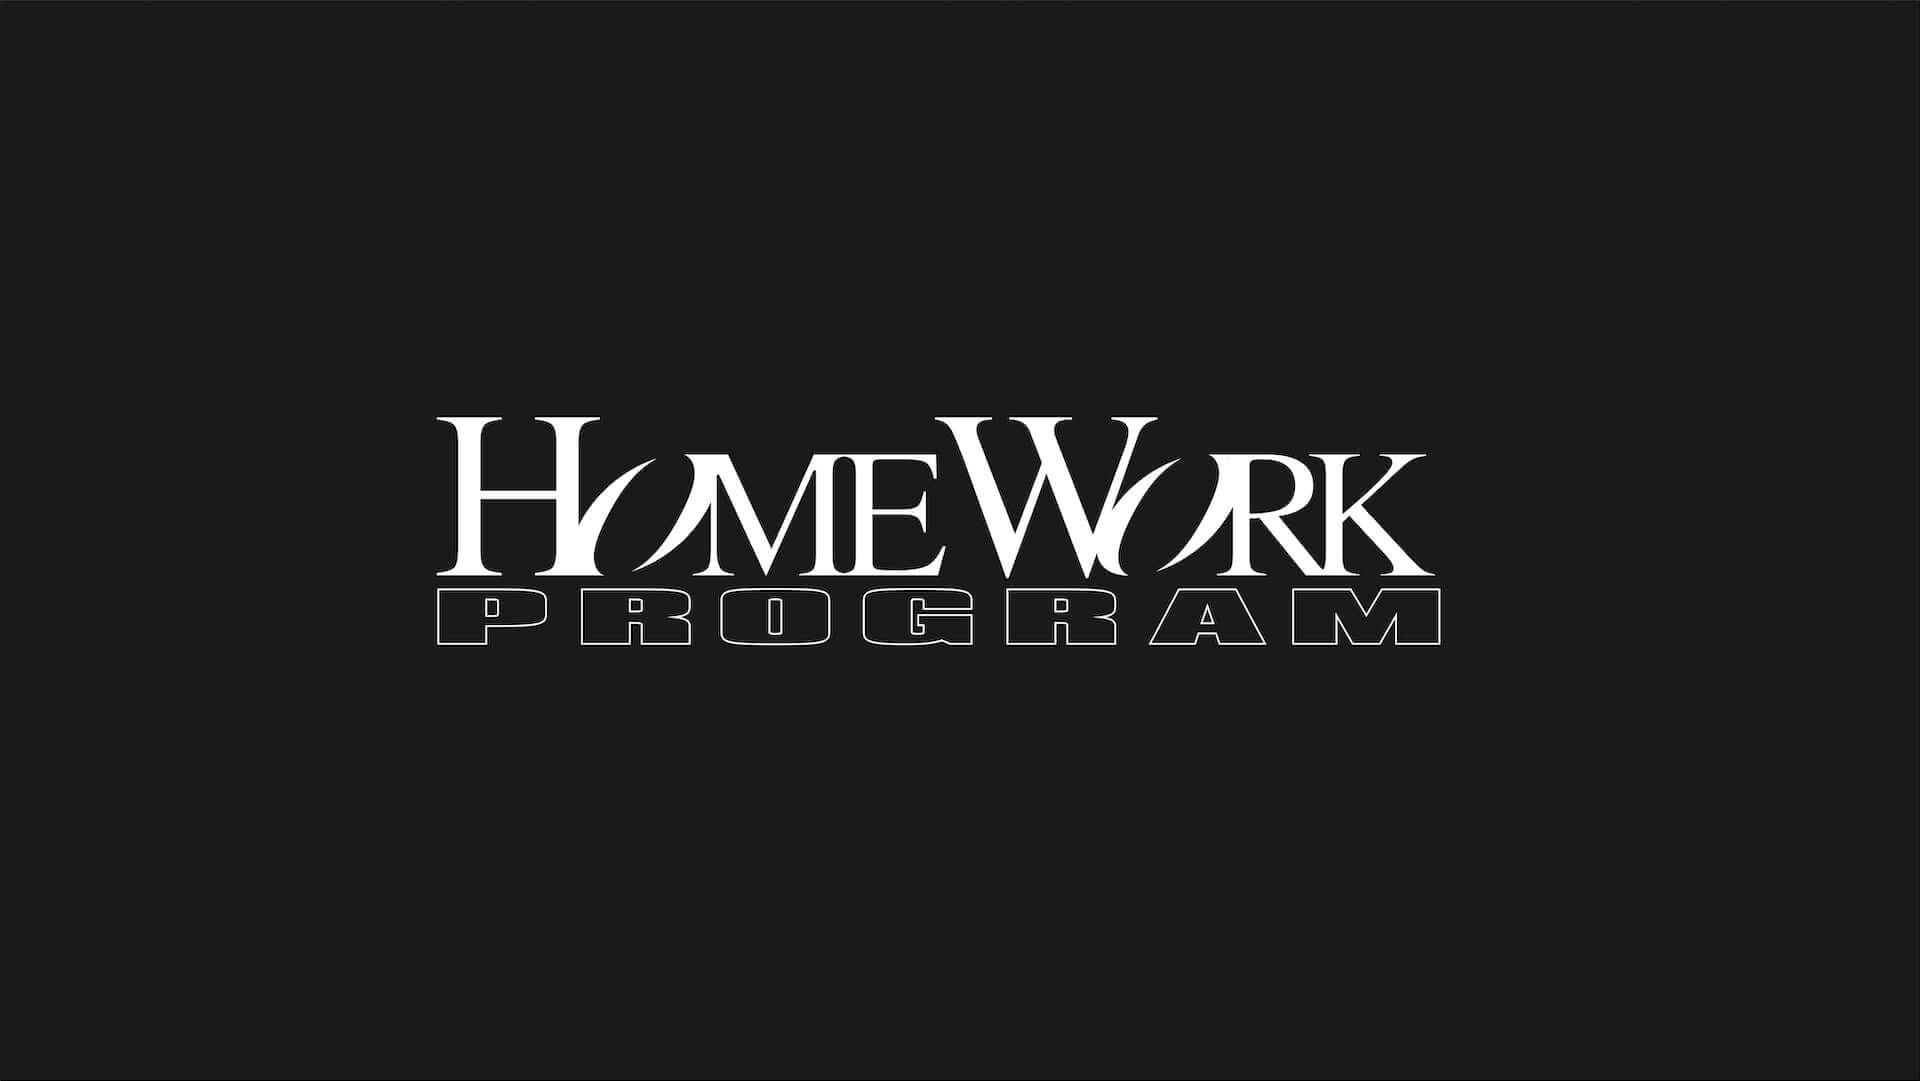 Sugar's Campaignでも活動するAvec Avecが、謎の部屋から行われるライブ配信番組『HOMEWORK PROGRAM』に出演決定! music200527_homework_program_2-1920x1081